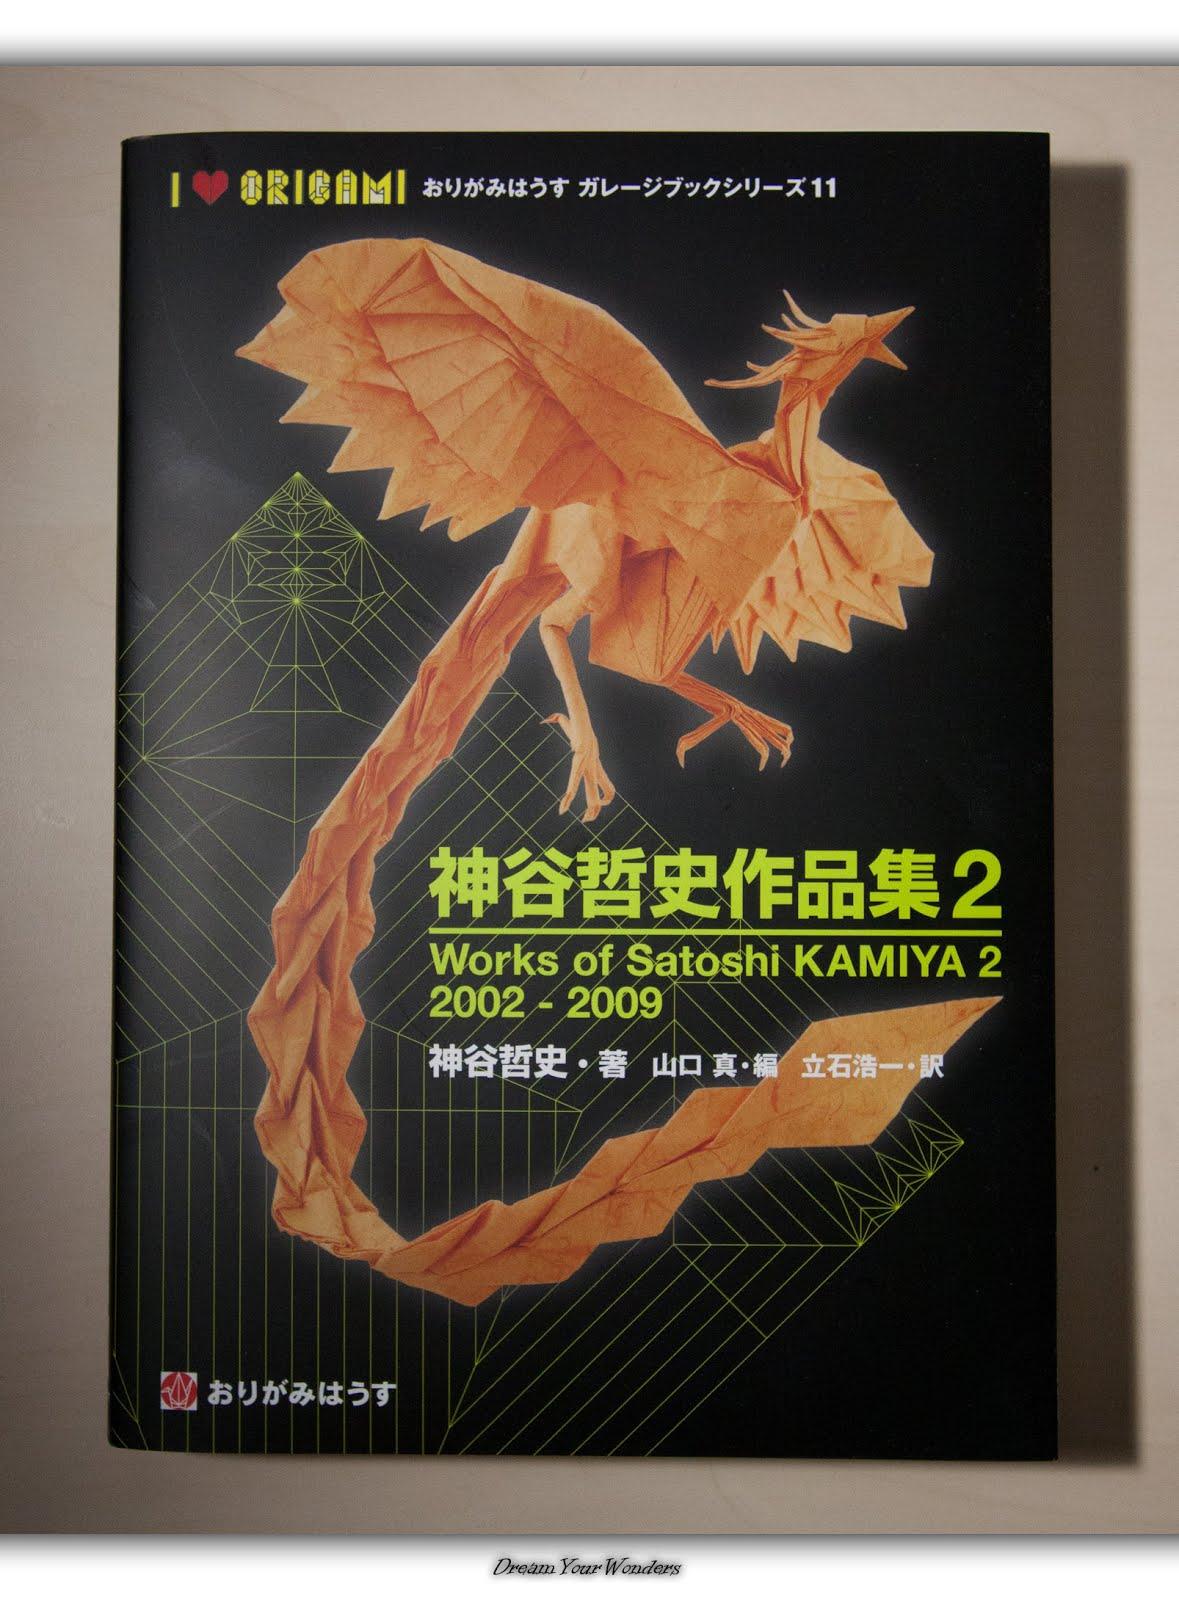 !!!HOT TRÊN CẢ HOT!!! Satoshi Kamiya 6500 YEN EBOOK  - Page 2 IMG_7769